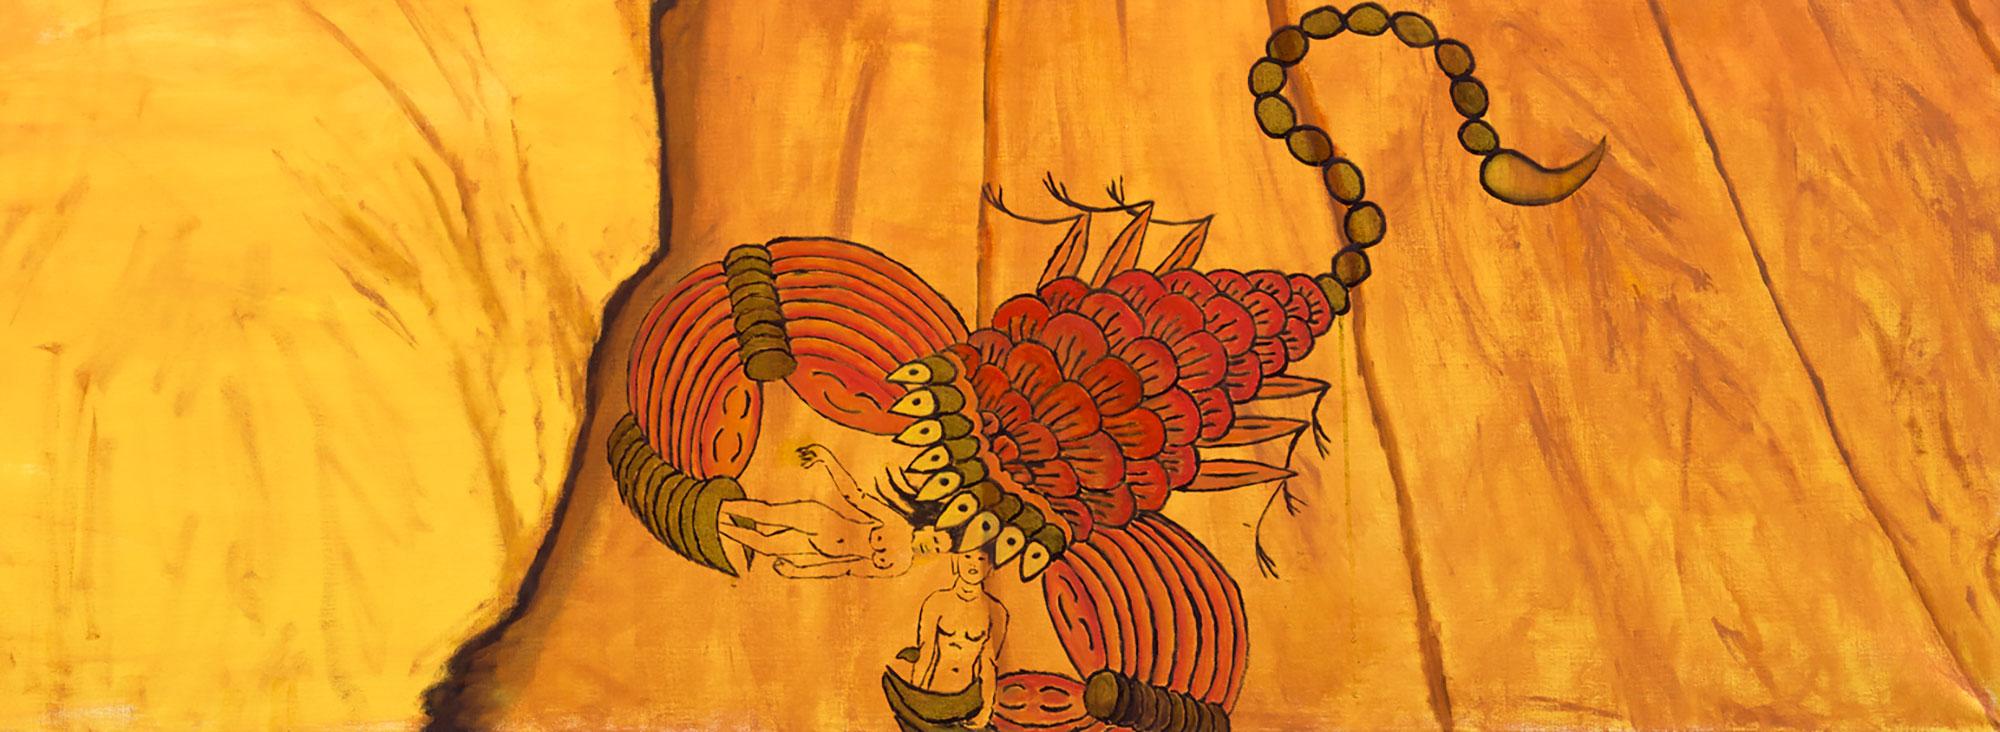 Leidy Churchman, Buddhadharma Fever